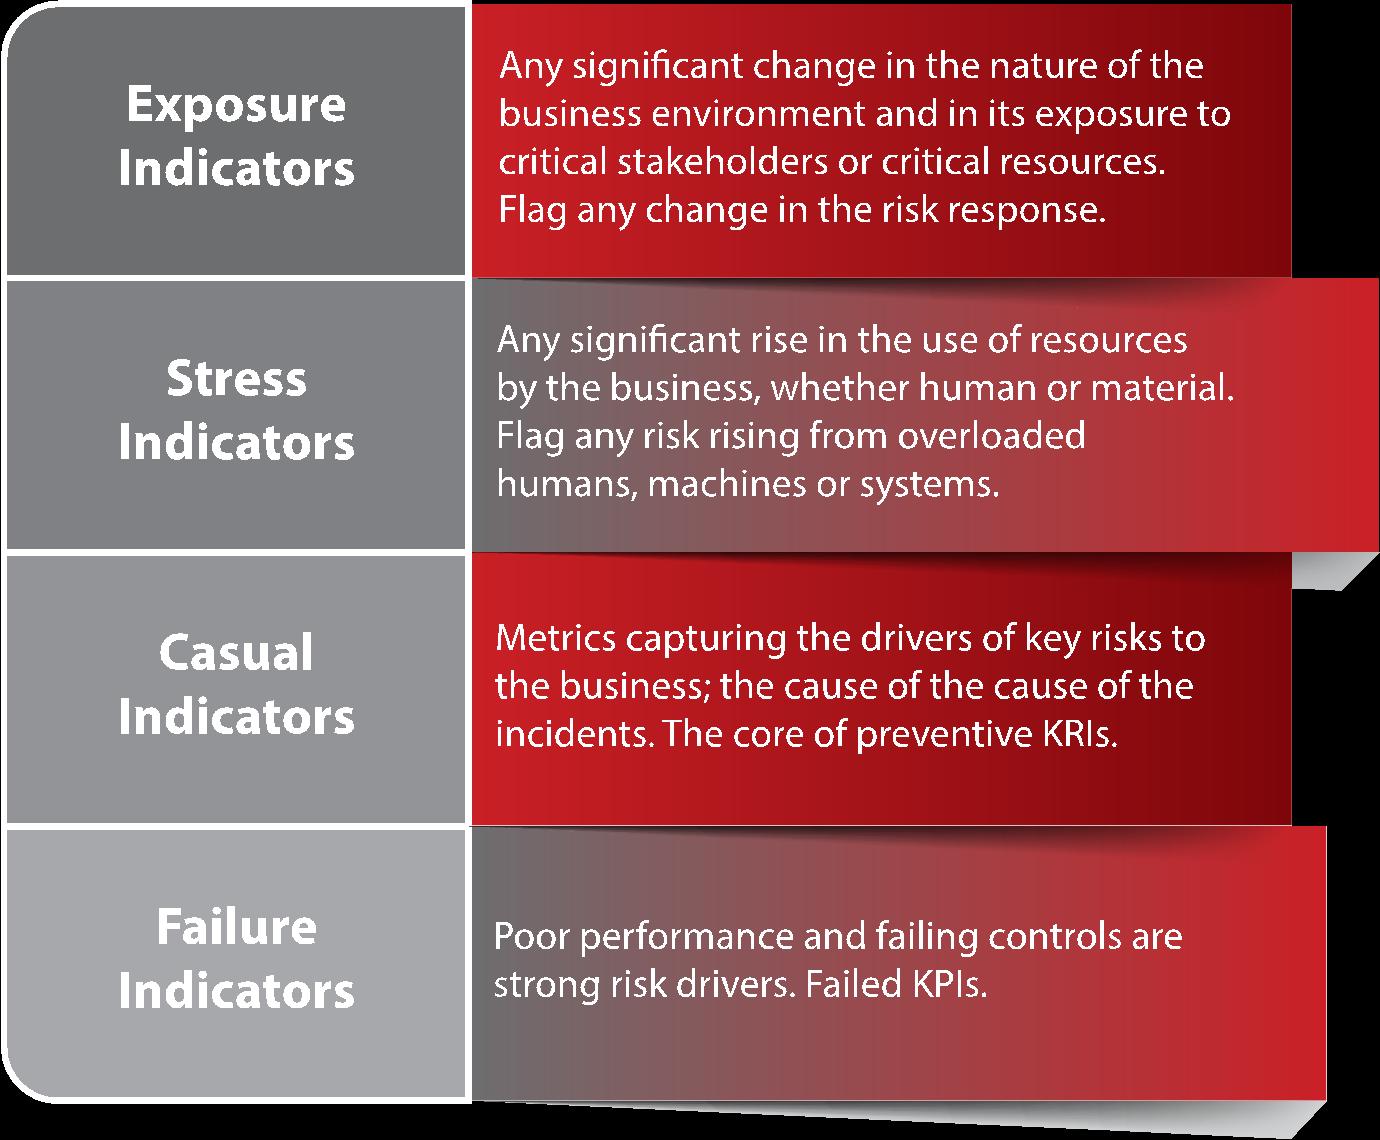 david-lannoy-key-risk-indicators-of-enterprise